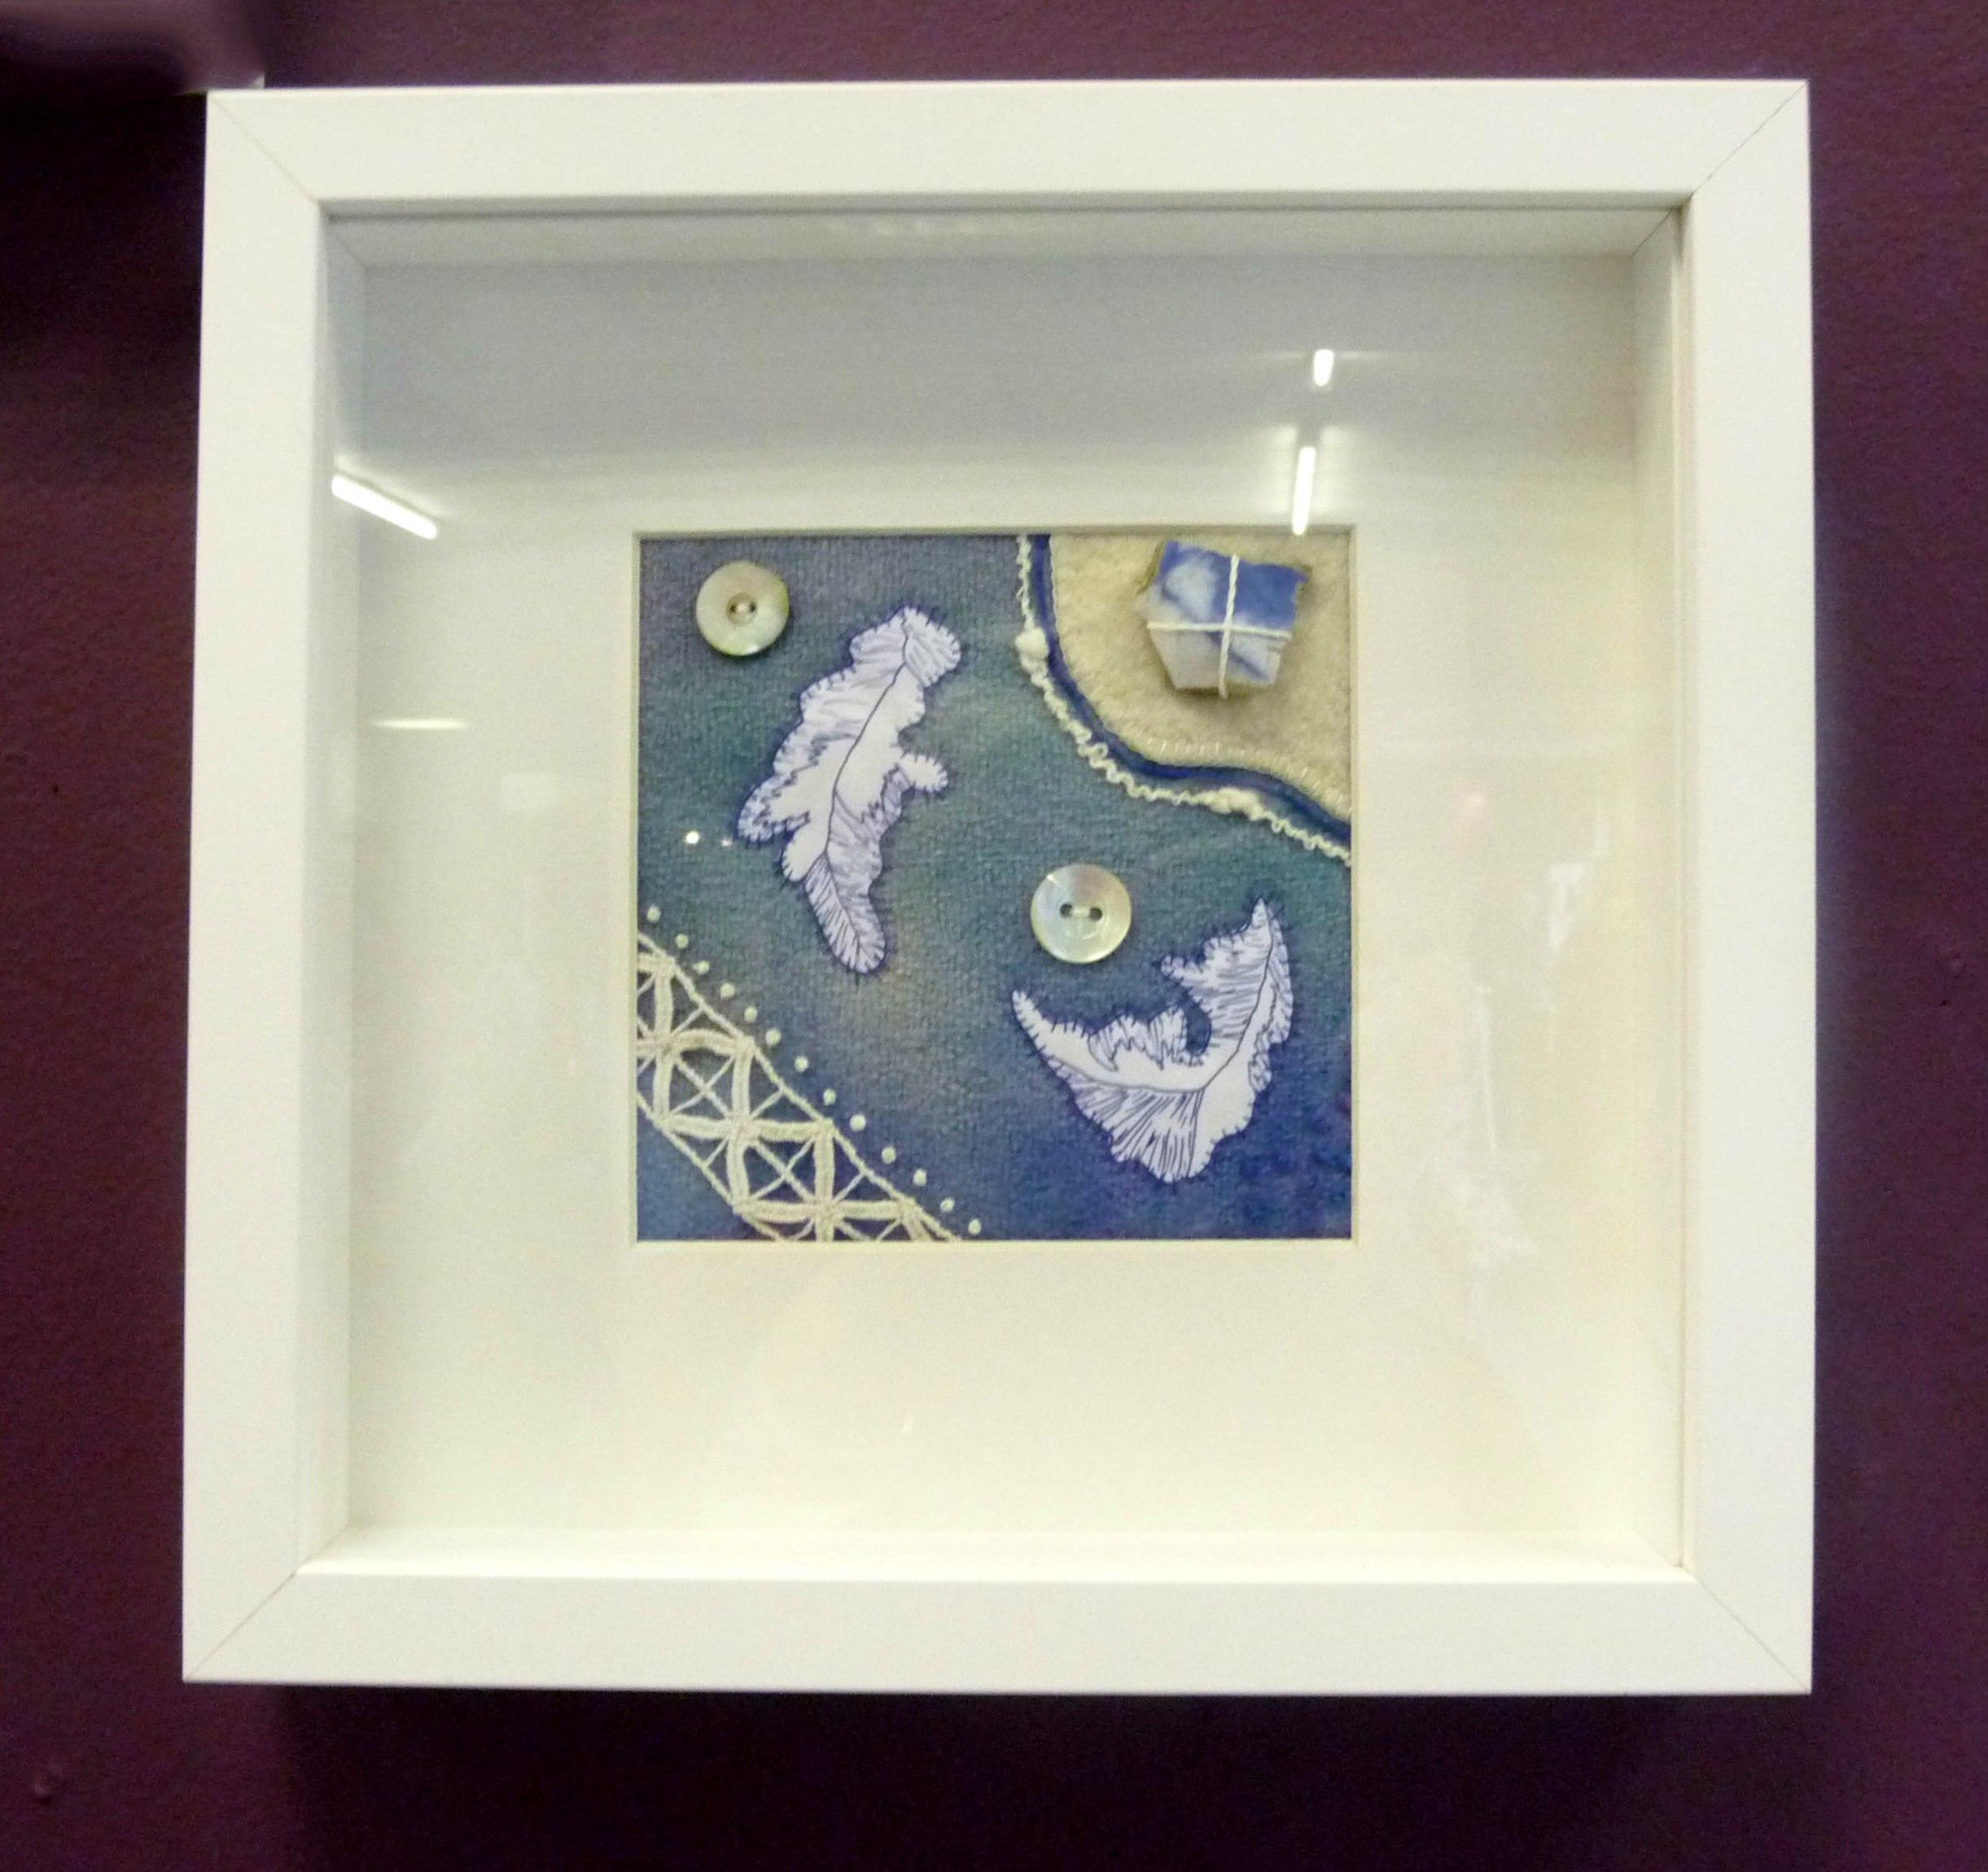 FRAGMENT 2 by Janet Wilkinson, hand stitch on blanket